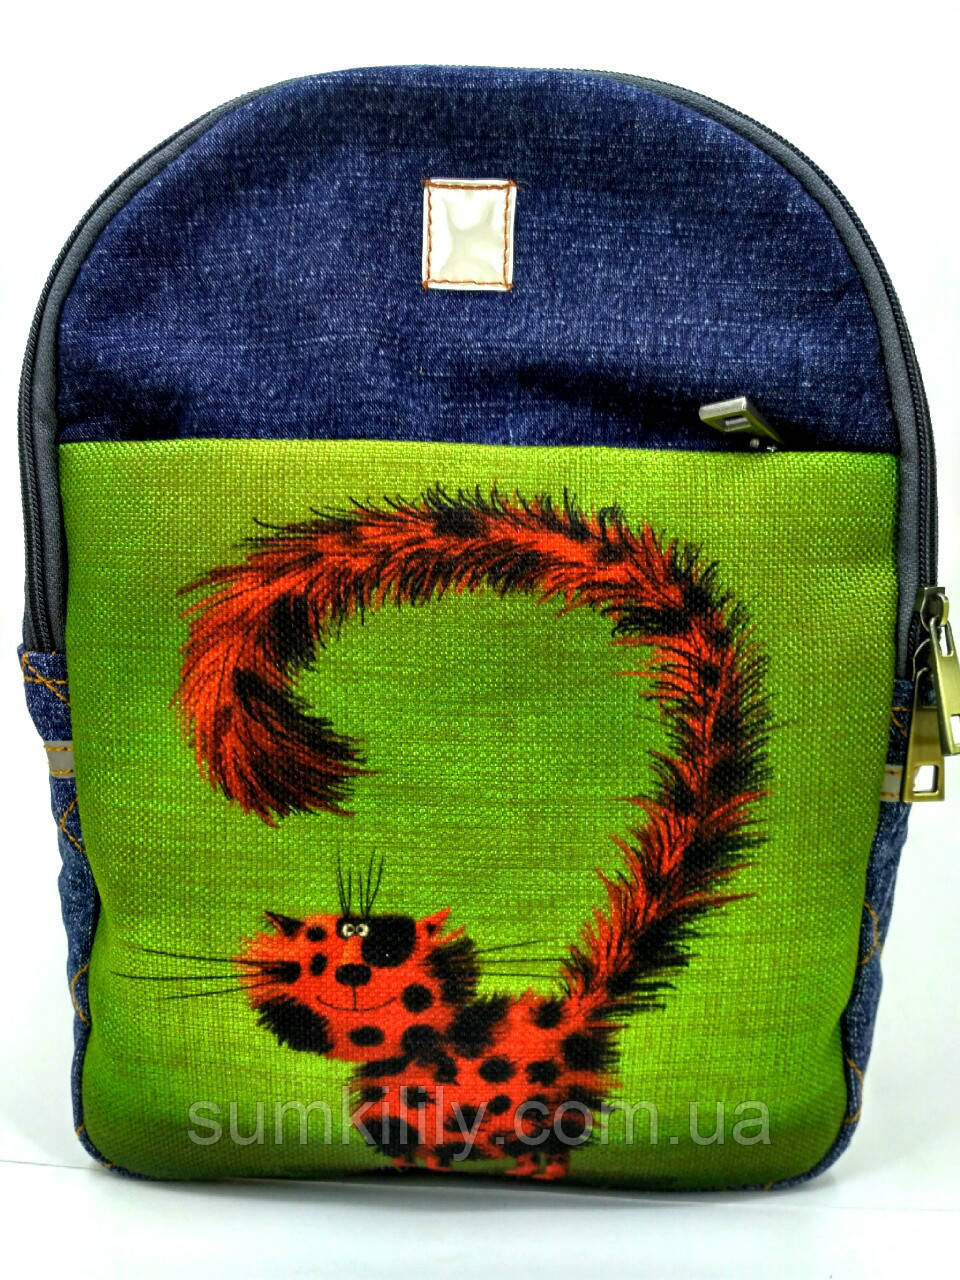 Детский рюкзак Кот хулиган